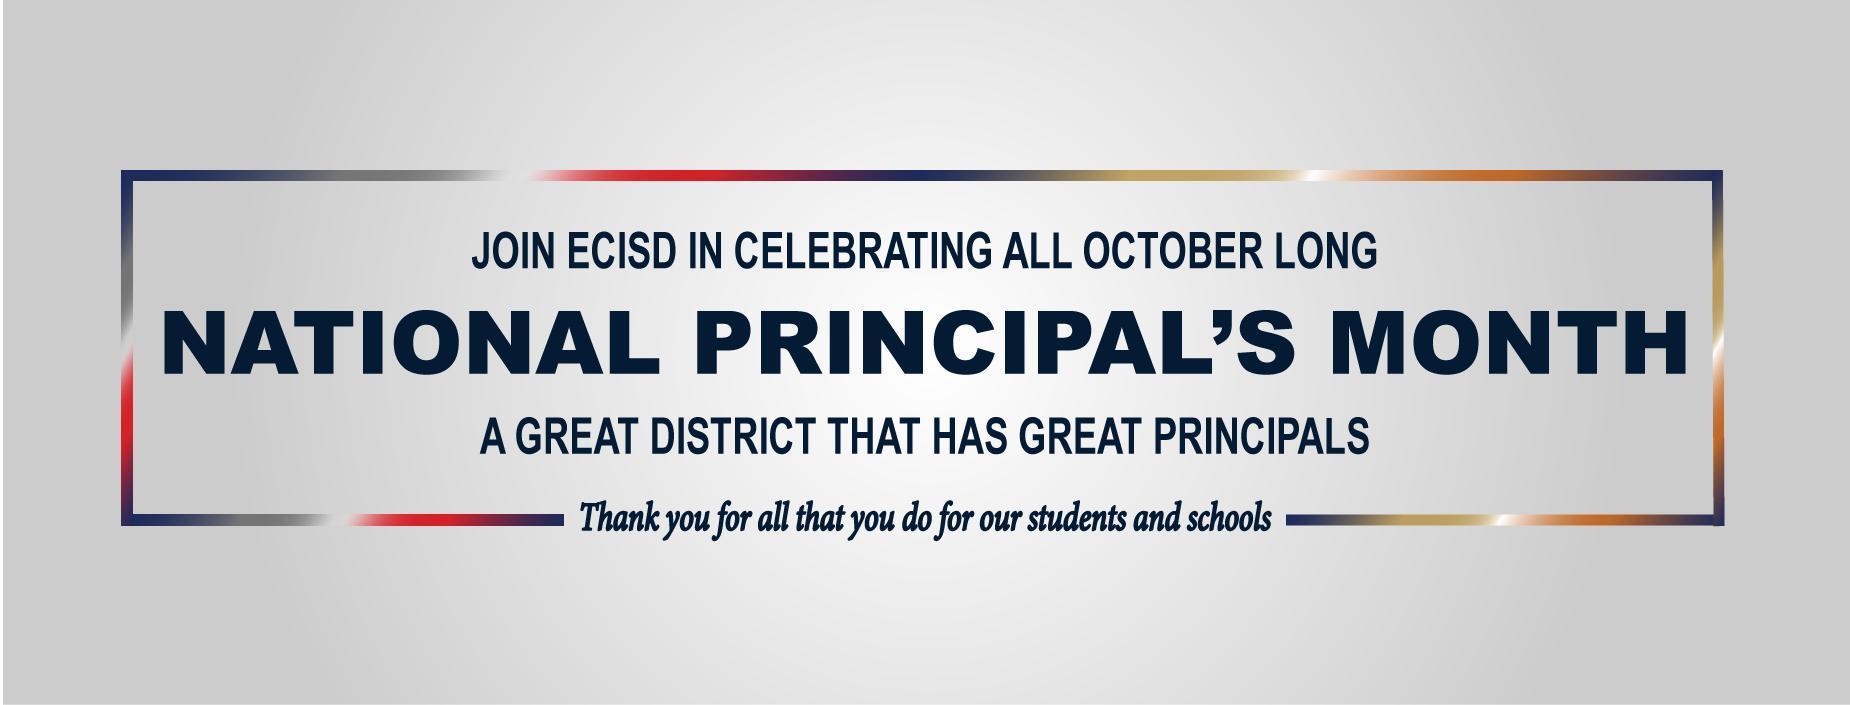 Principal's Month Banner